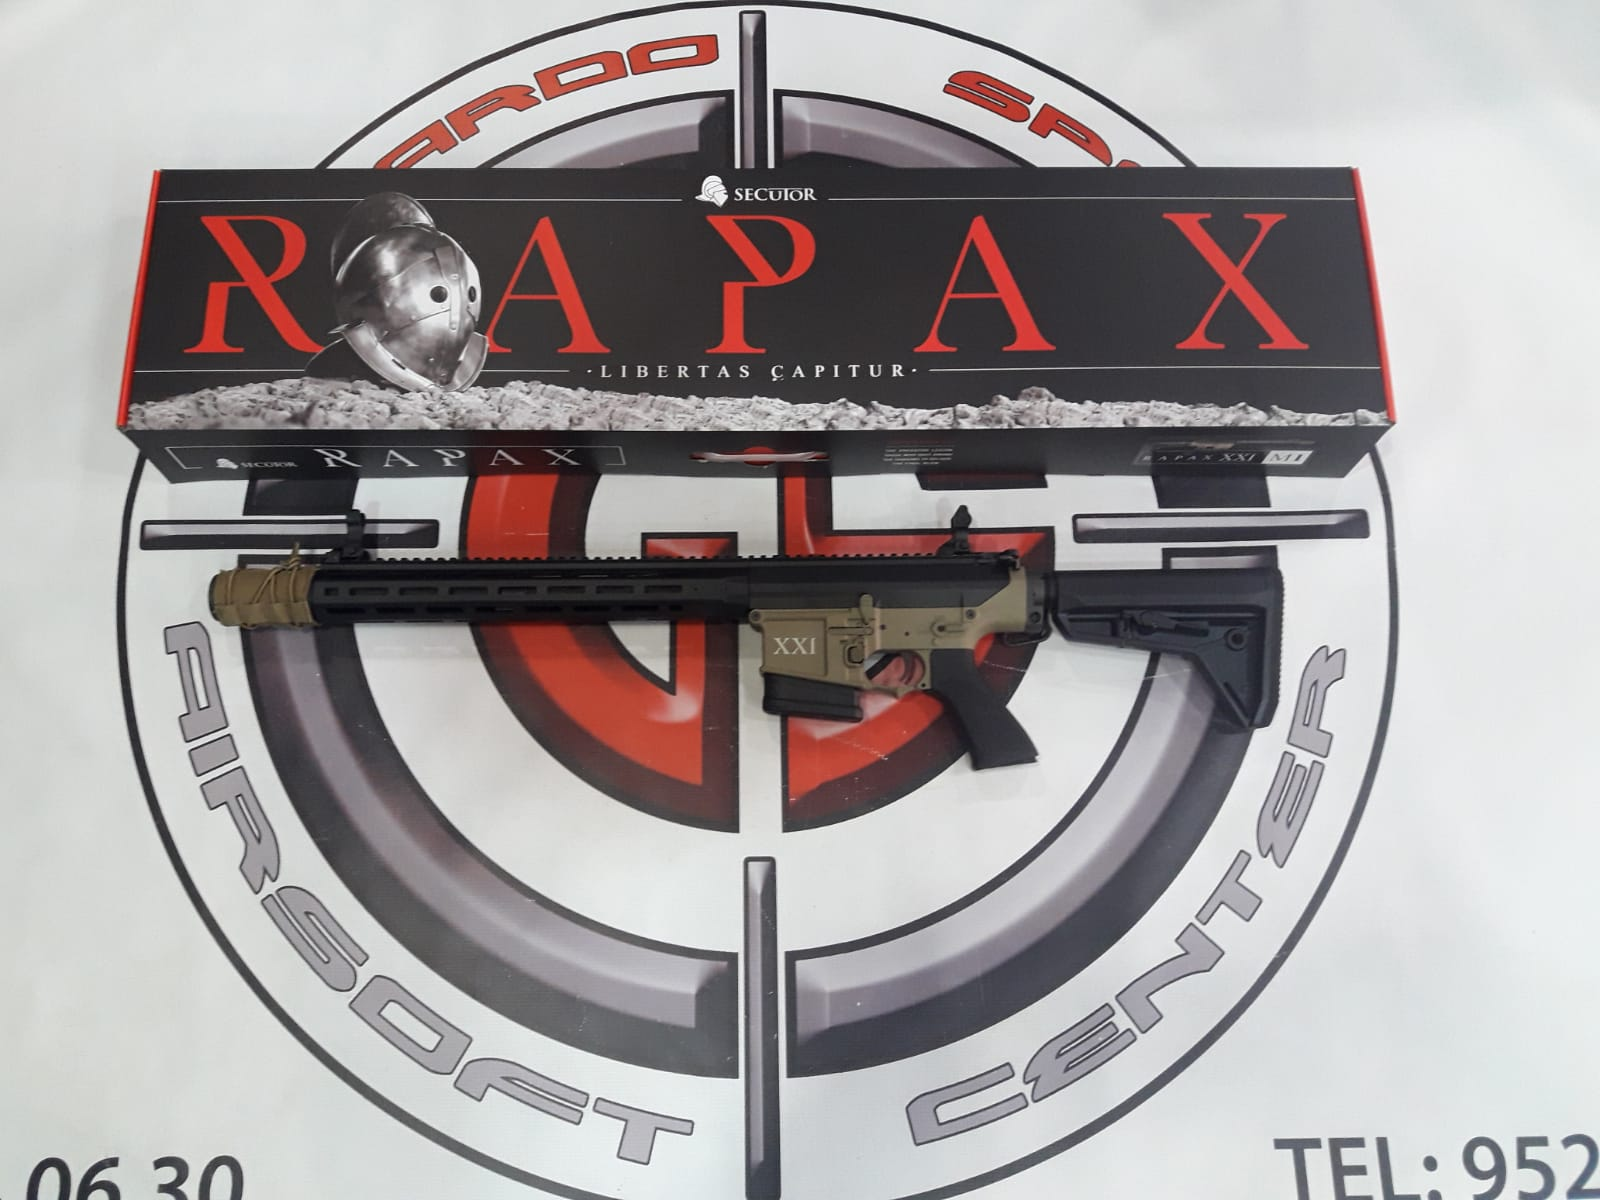 DMR RAPAX XXI M.2 SECUTOR